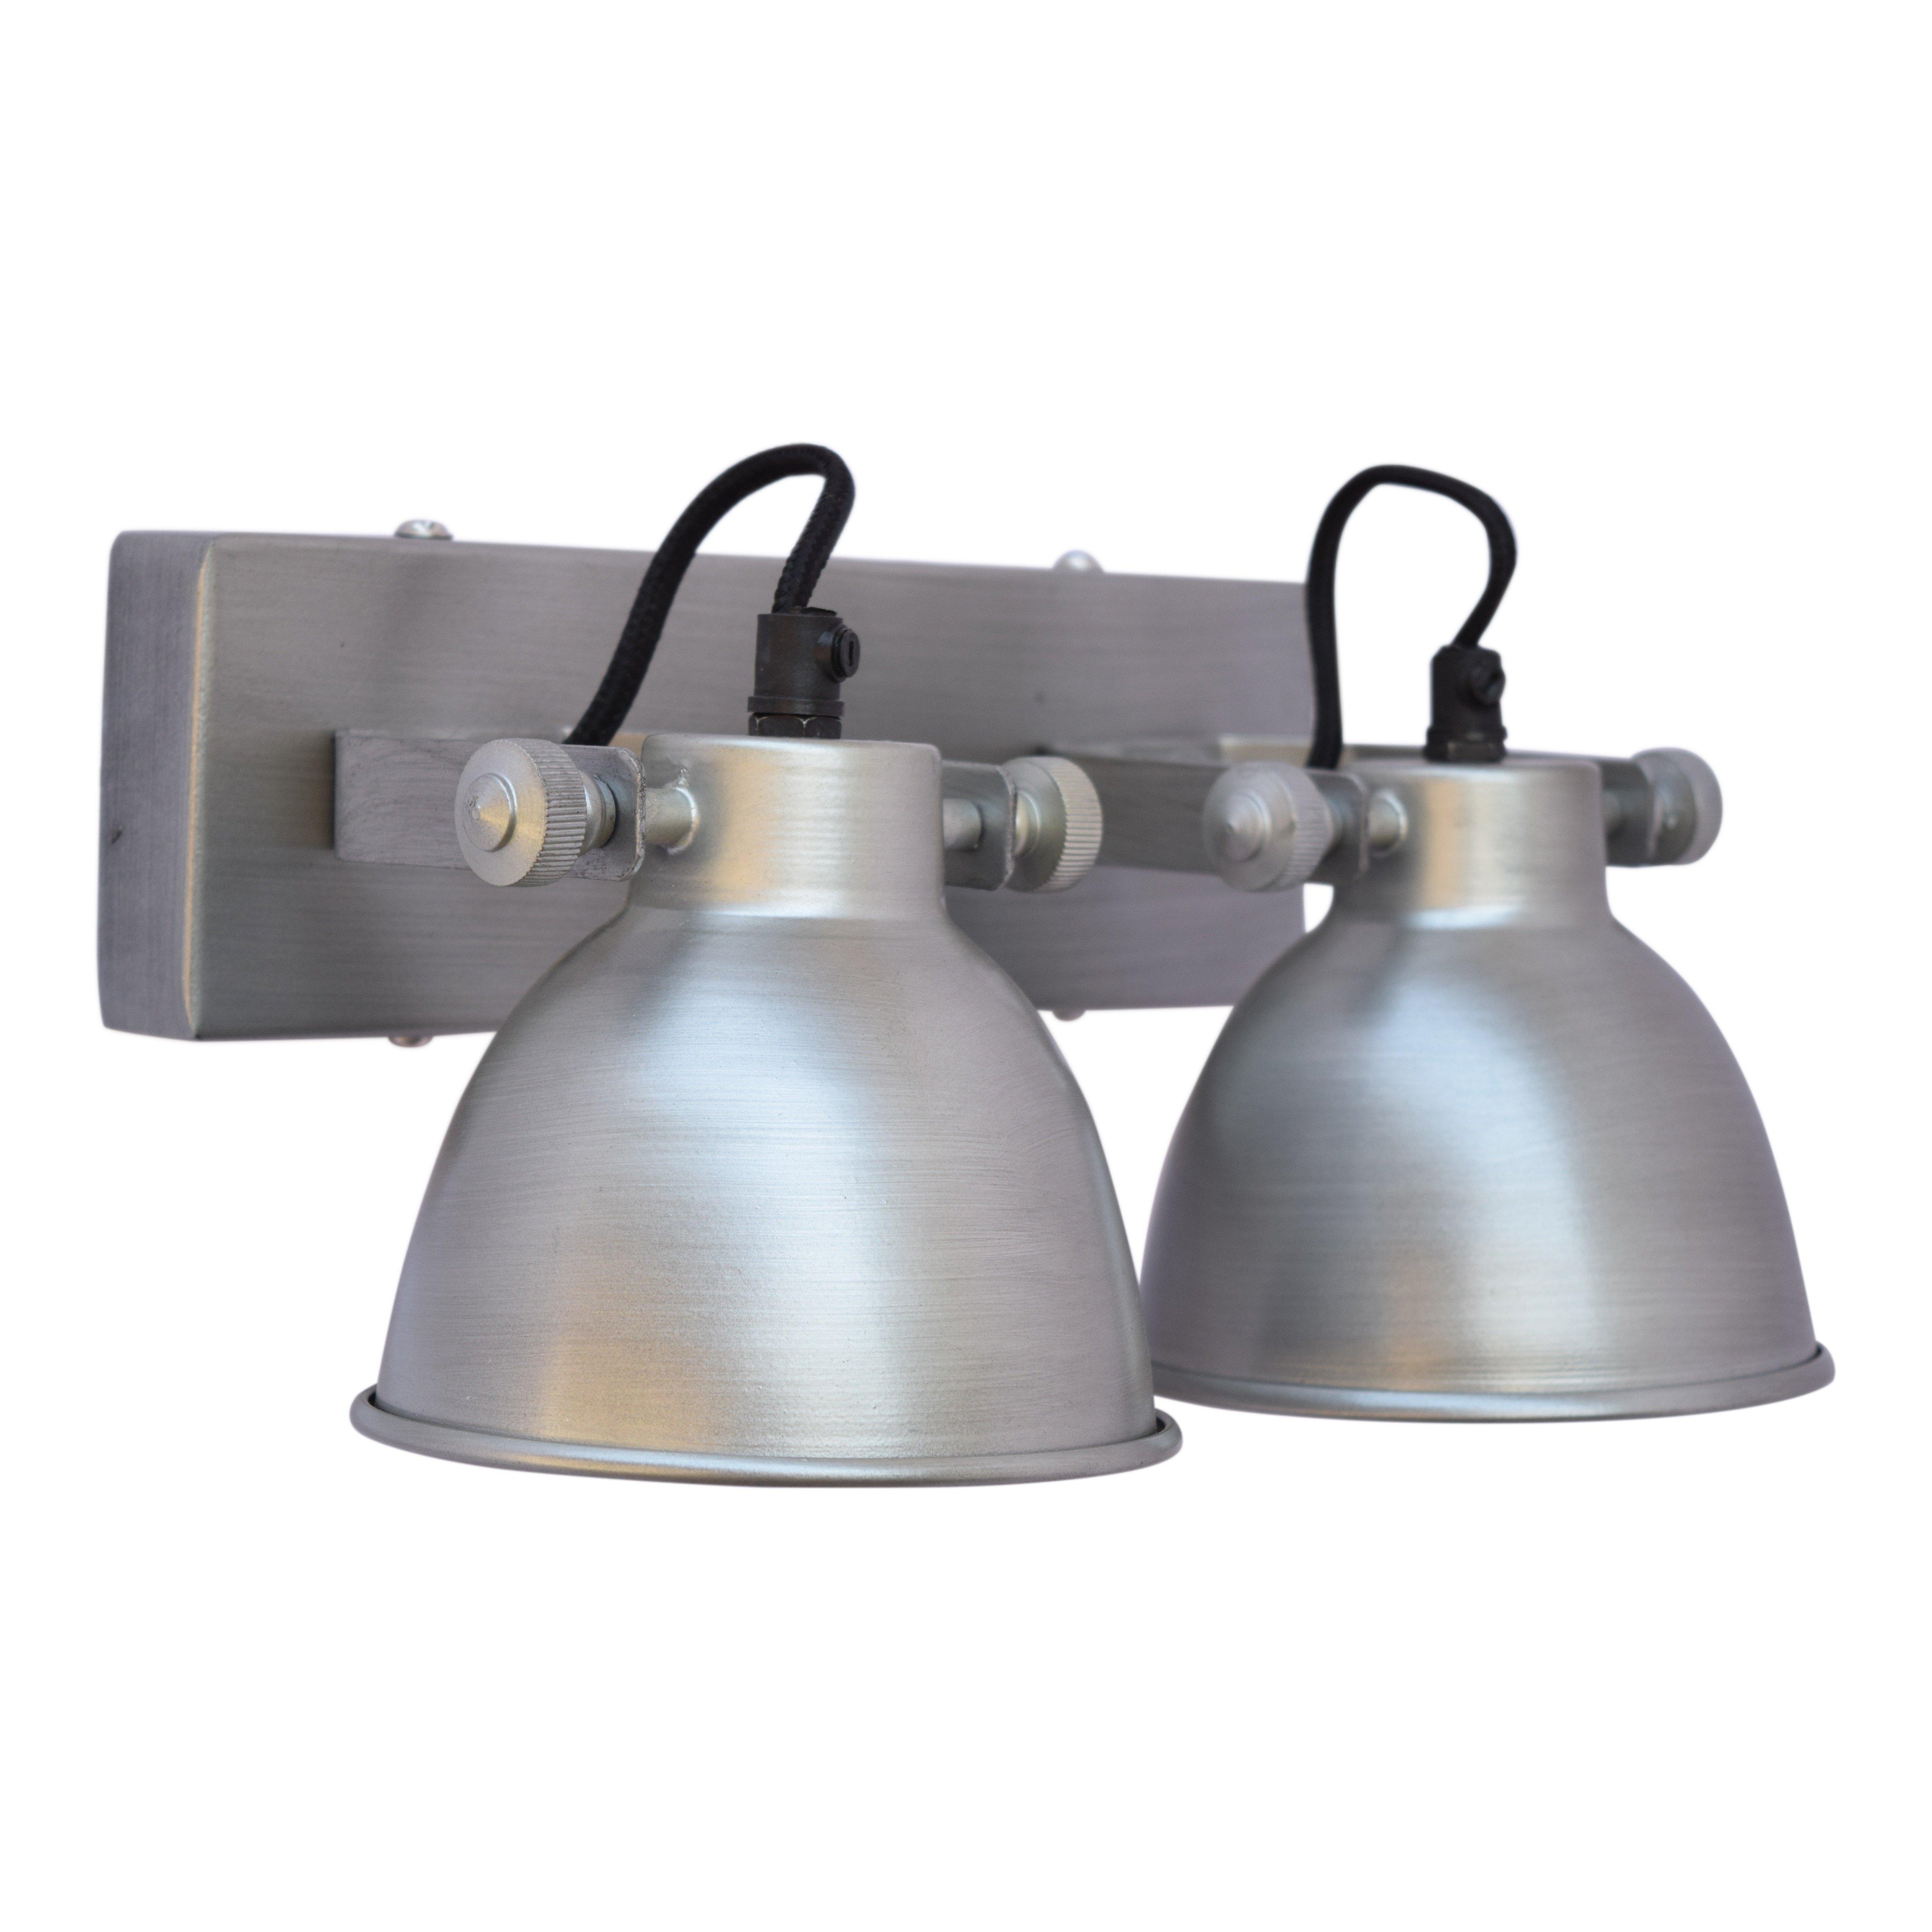 Urban Interiors Wandlamp Double Antique zink Ur. AI-WL-DBL-21-AZ